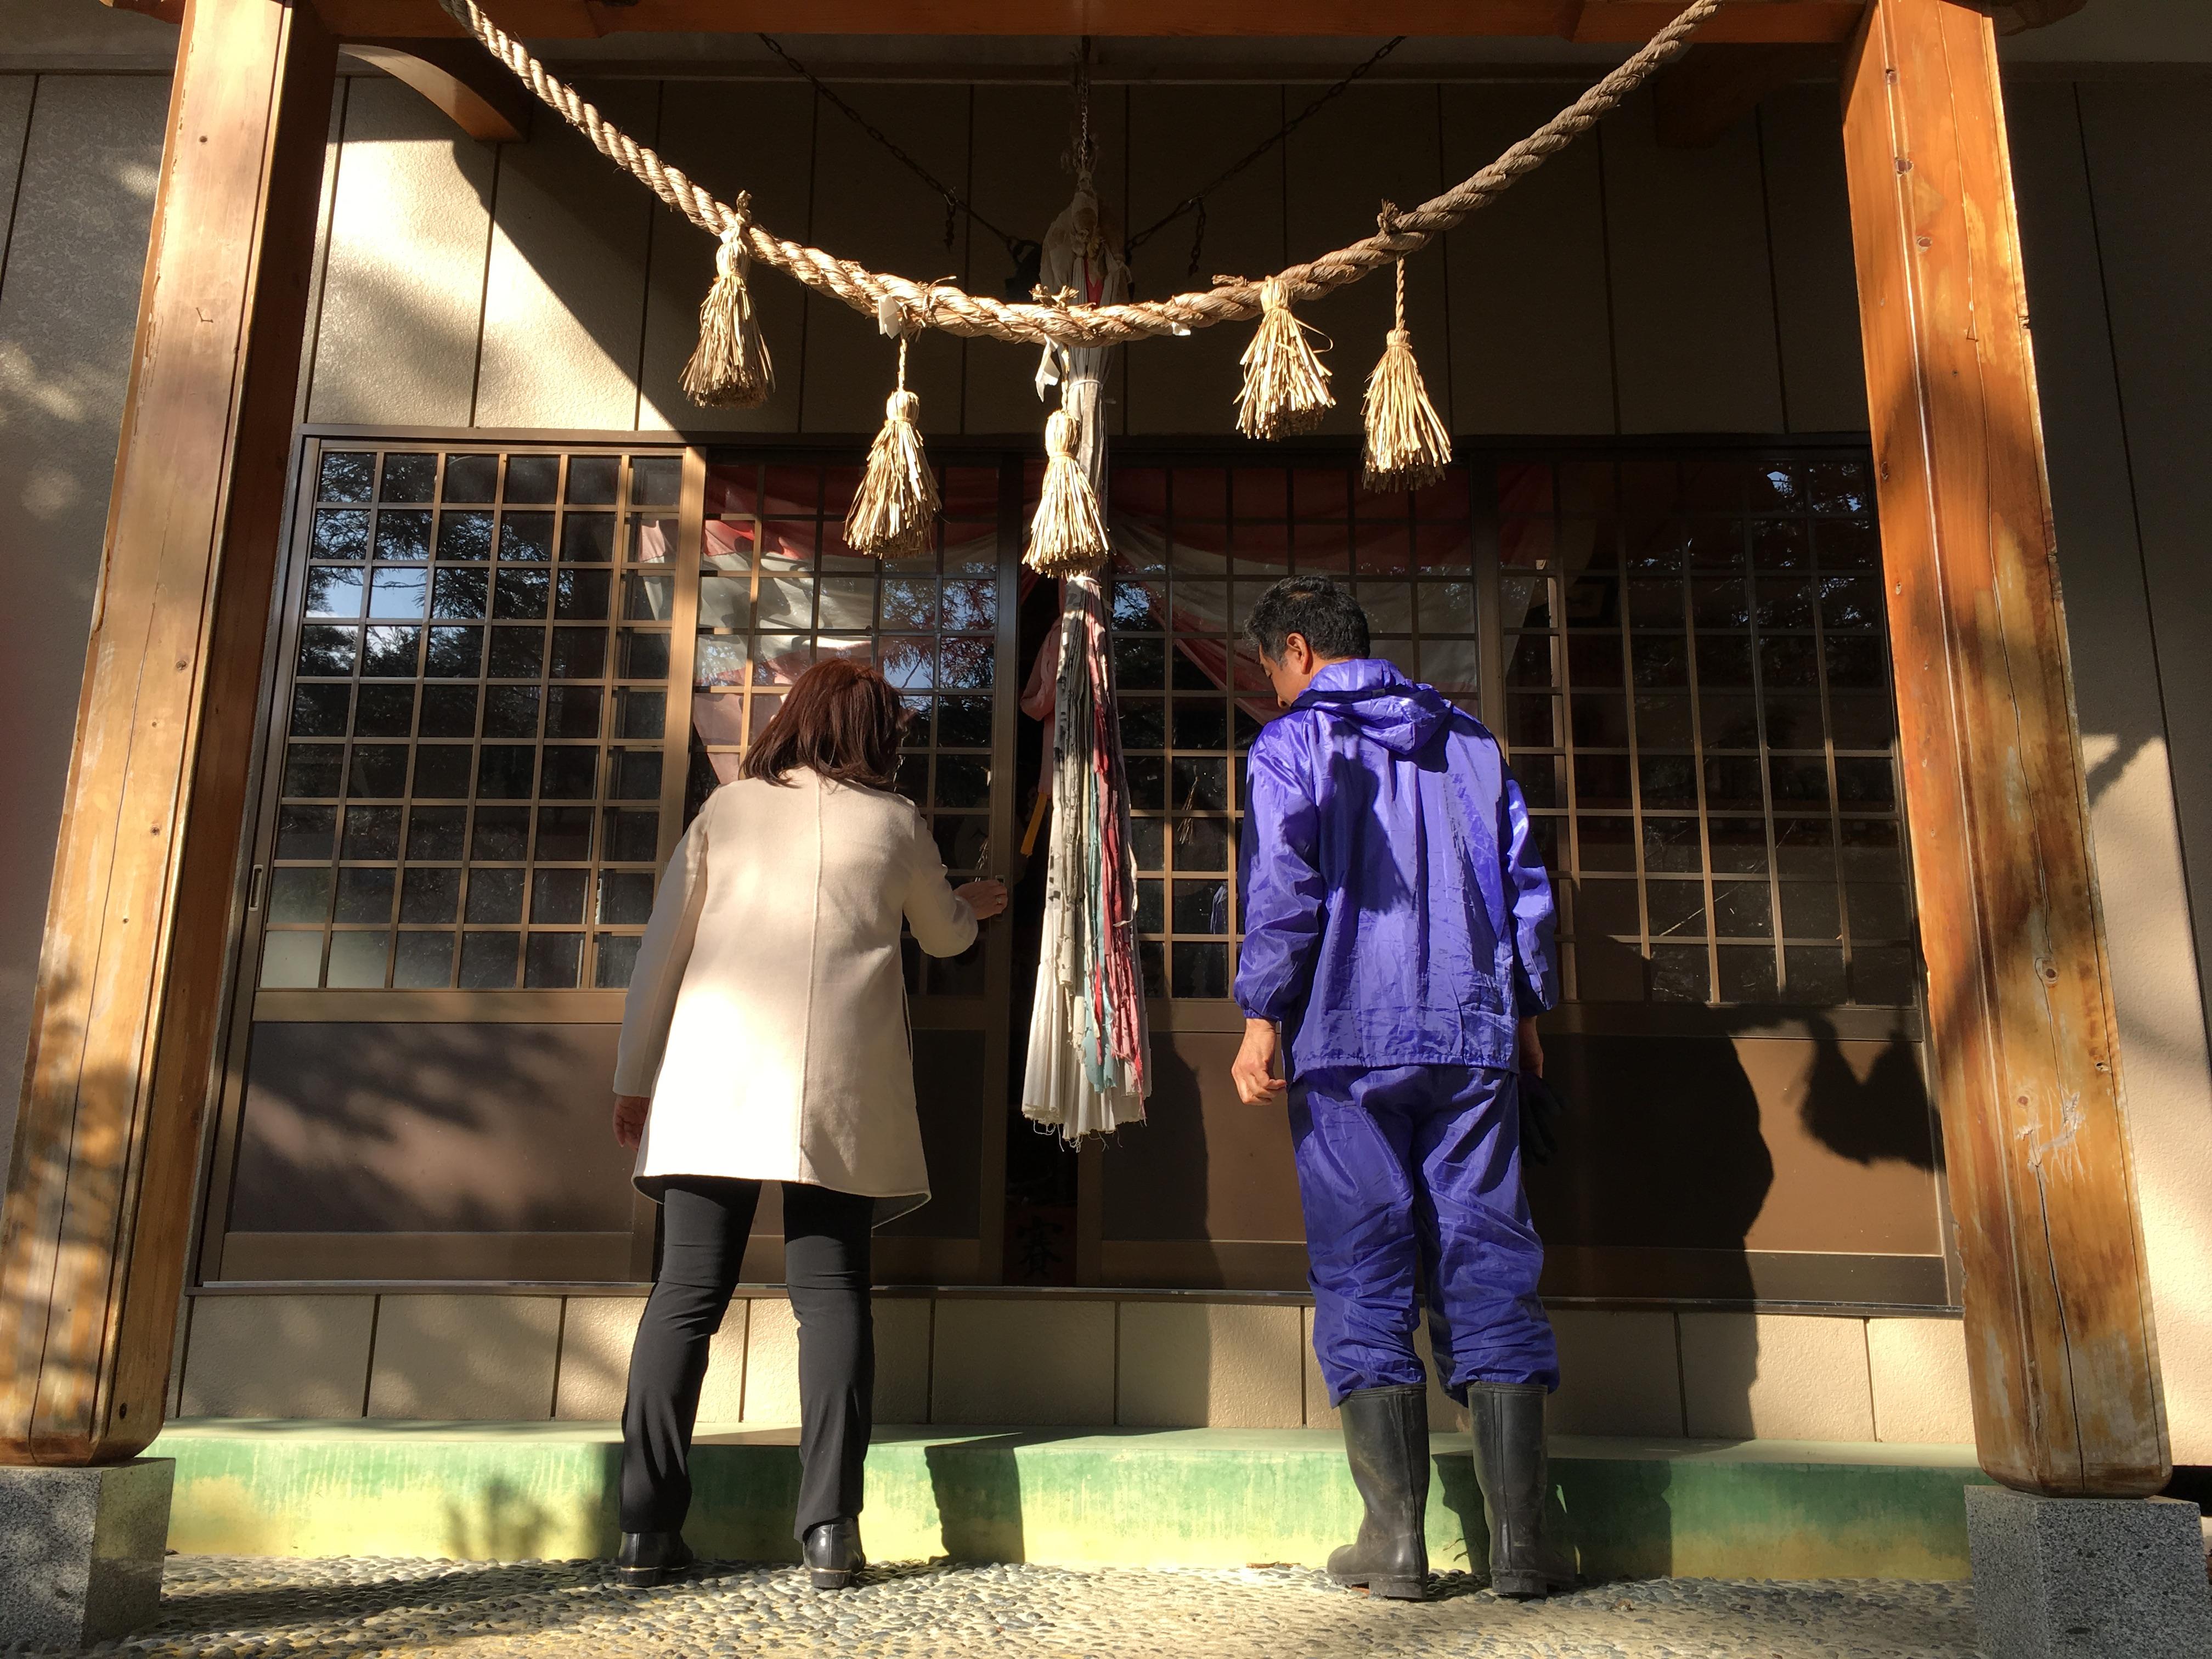 otsuchi kanako and husband at family shrine 2016.JPG